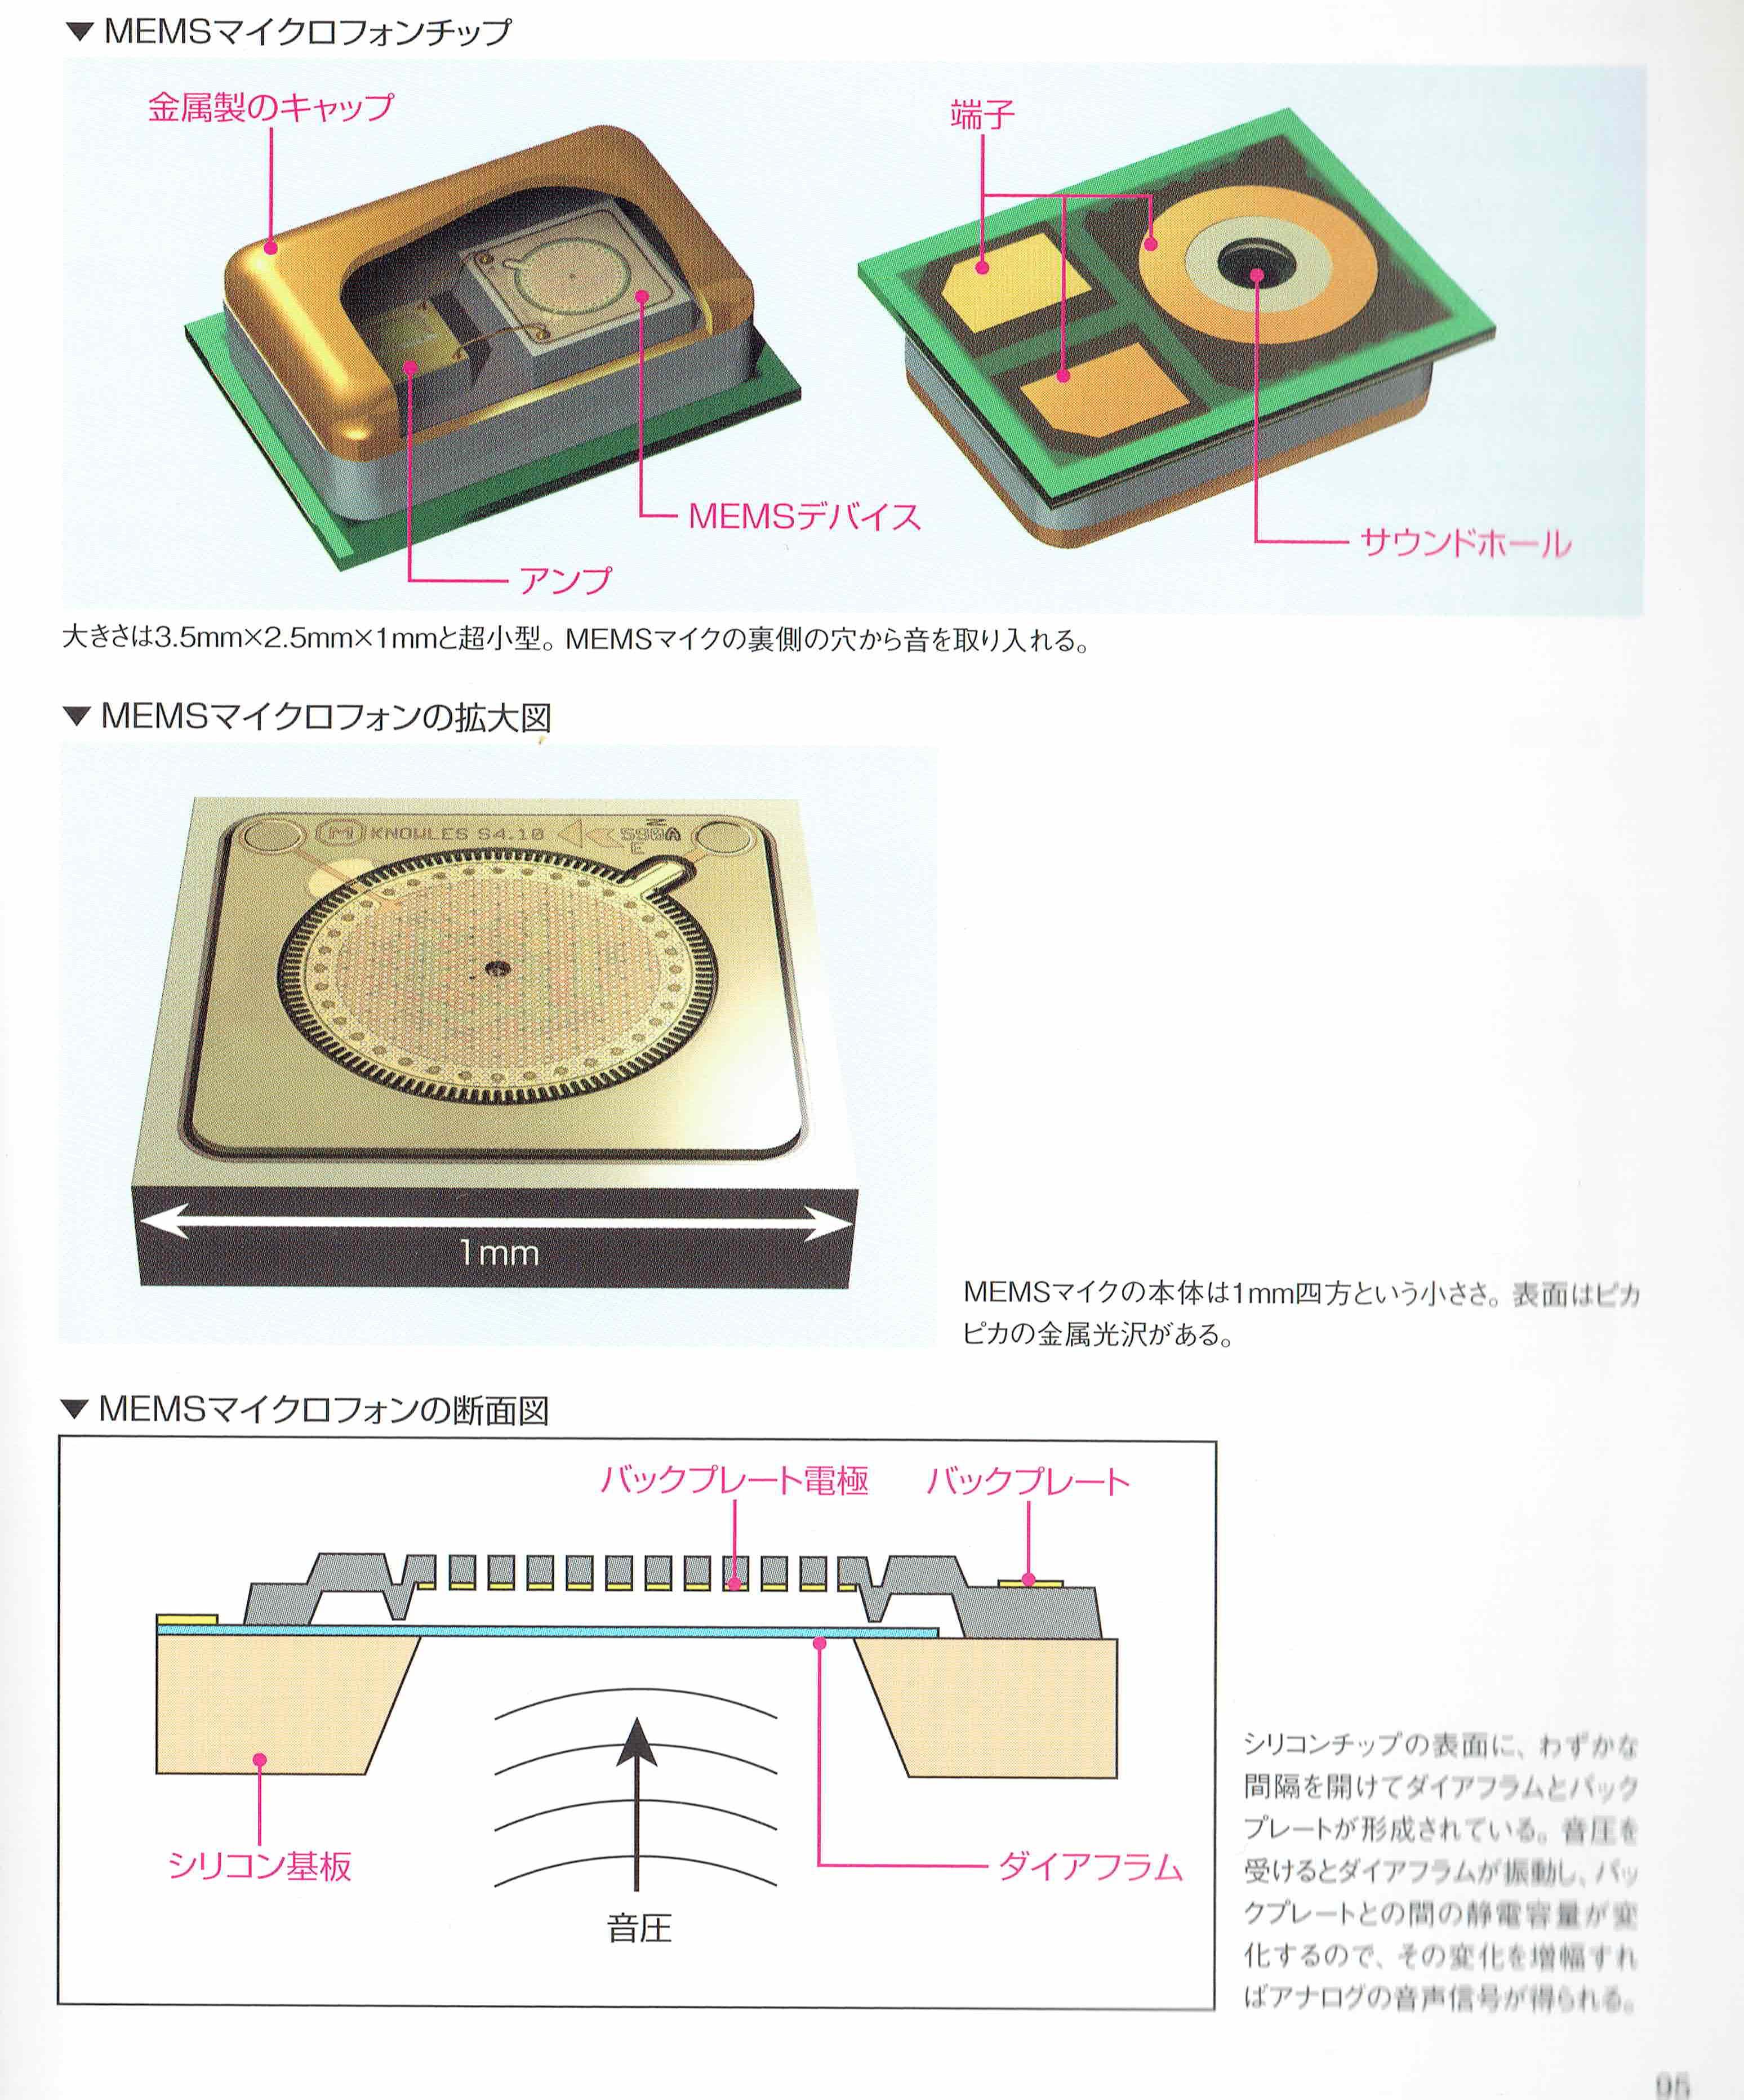 41J Blog » Blog Archive The iPhone's MEMS sensors - 41J Blog